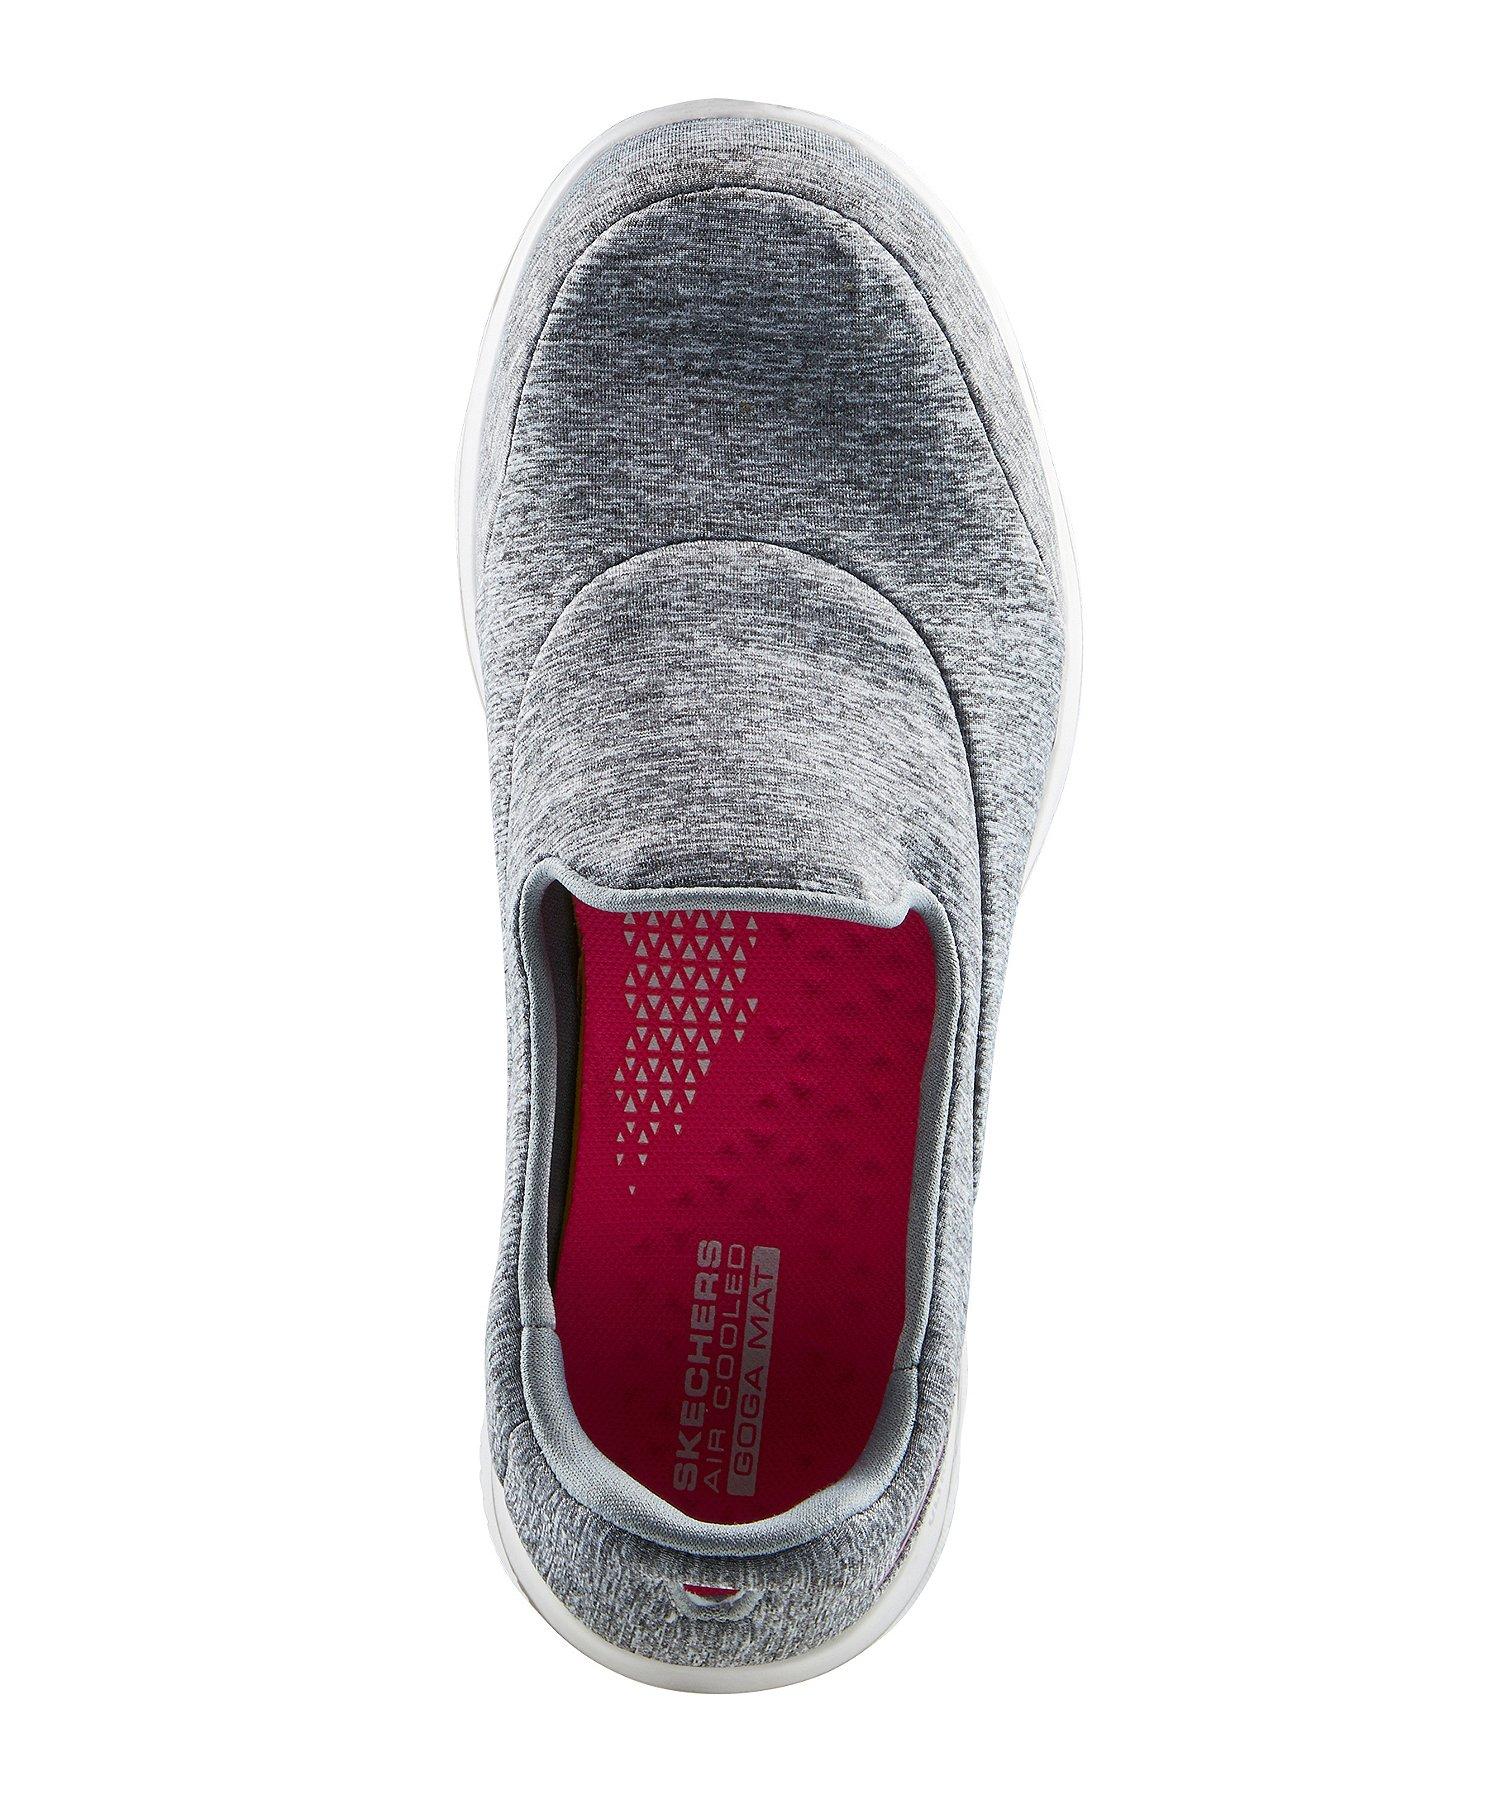 Skechers Go Walk Evolution Ultra Amazed Womens Grey 38 EU